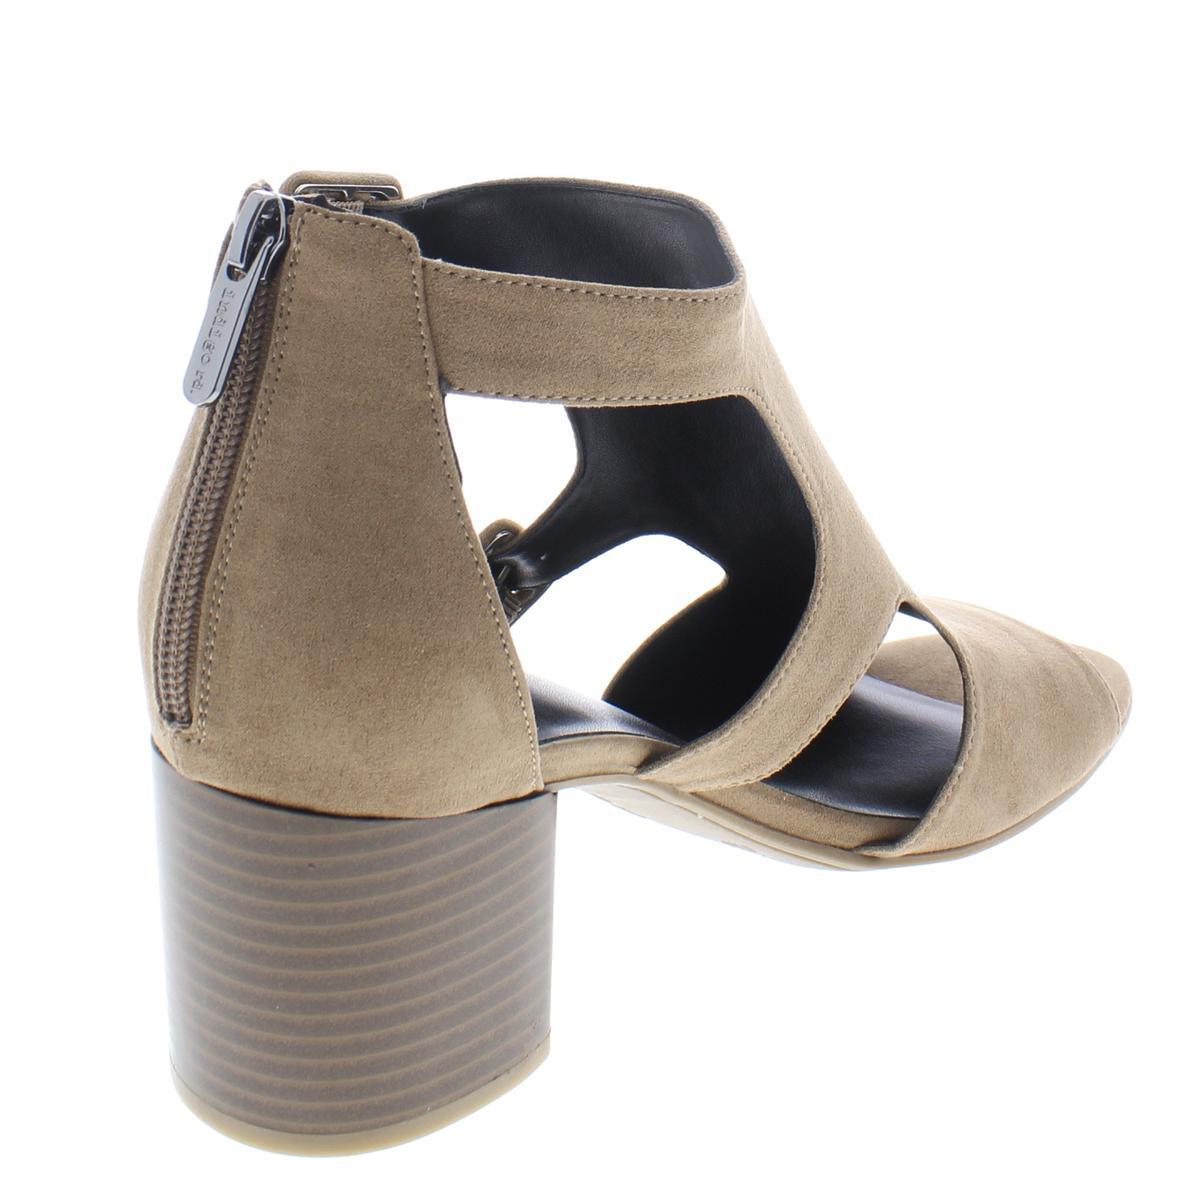 Indigo-Rd-Womens-Mandi-Faux-Suede-Buckle-Open-Toe-Heels-Sandals-BHFO-1720 thumbnail 4